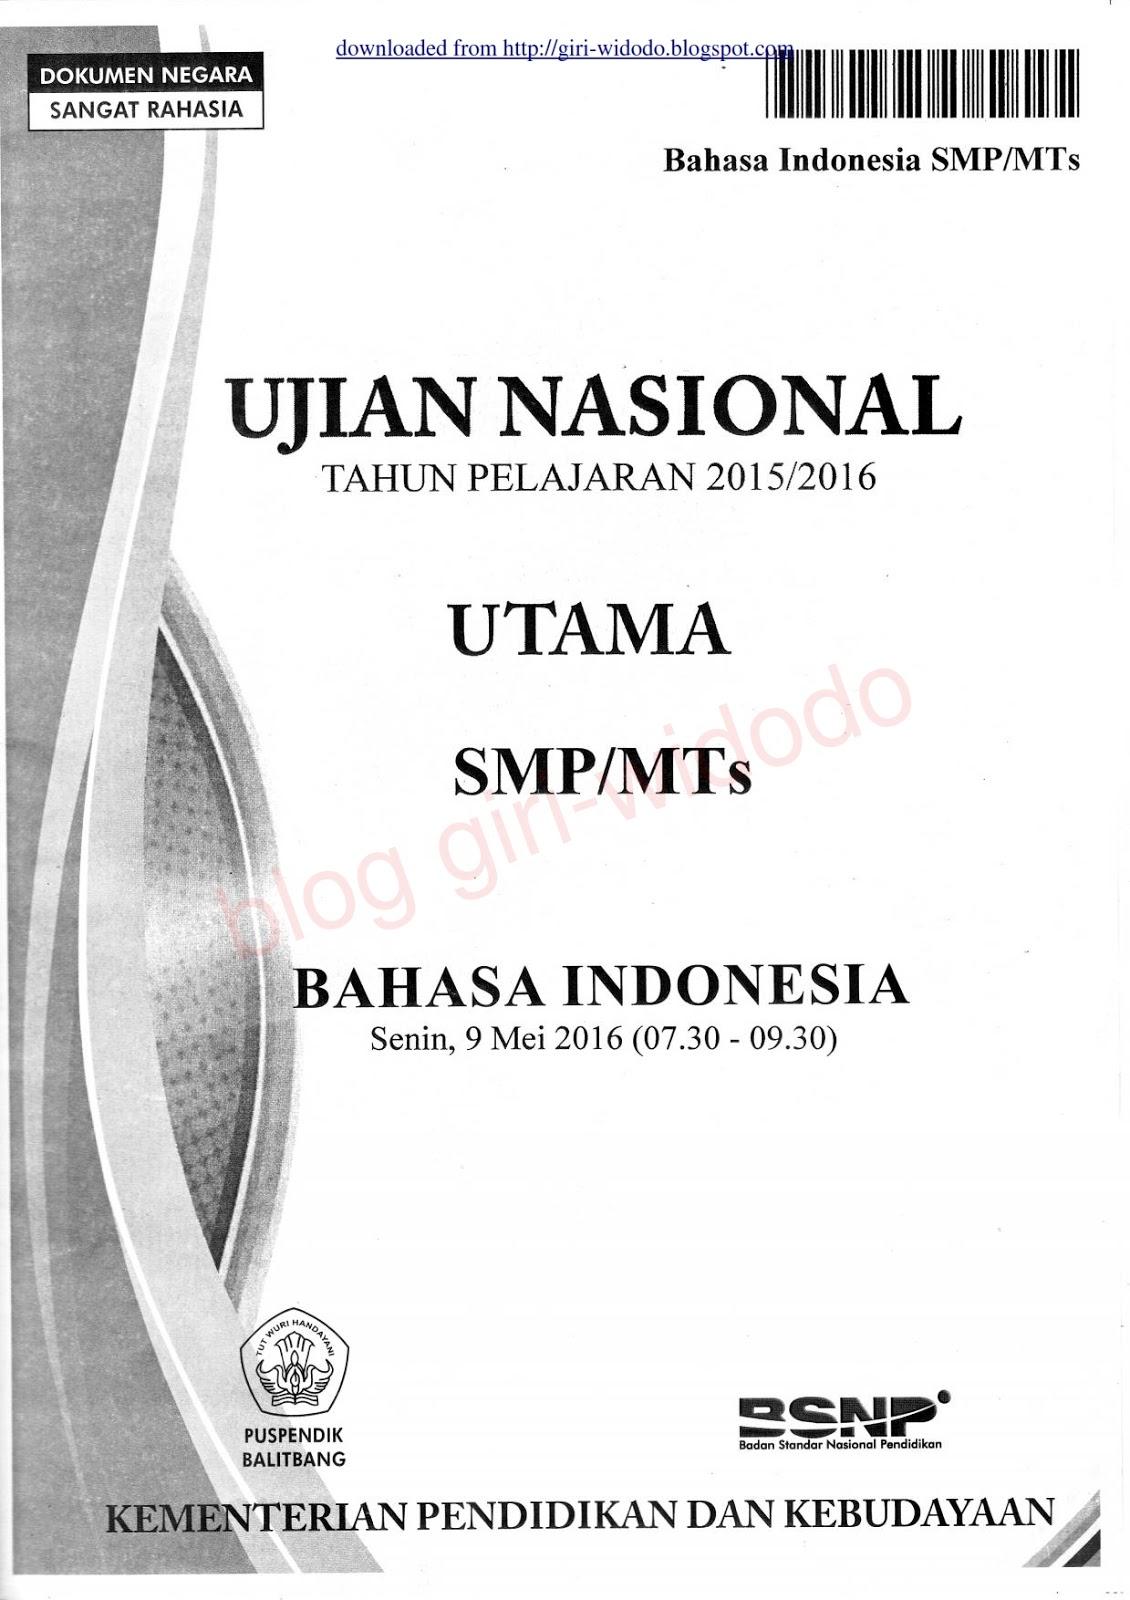 Soal Un Ipa 2016 Smp : Download, Bahasa, Indonesia, (Naskah, 2016), WIDODO